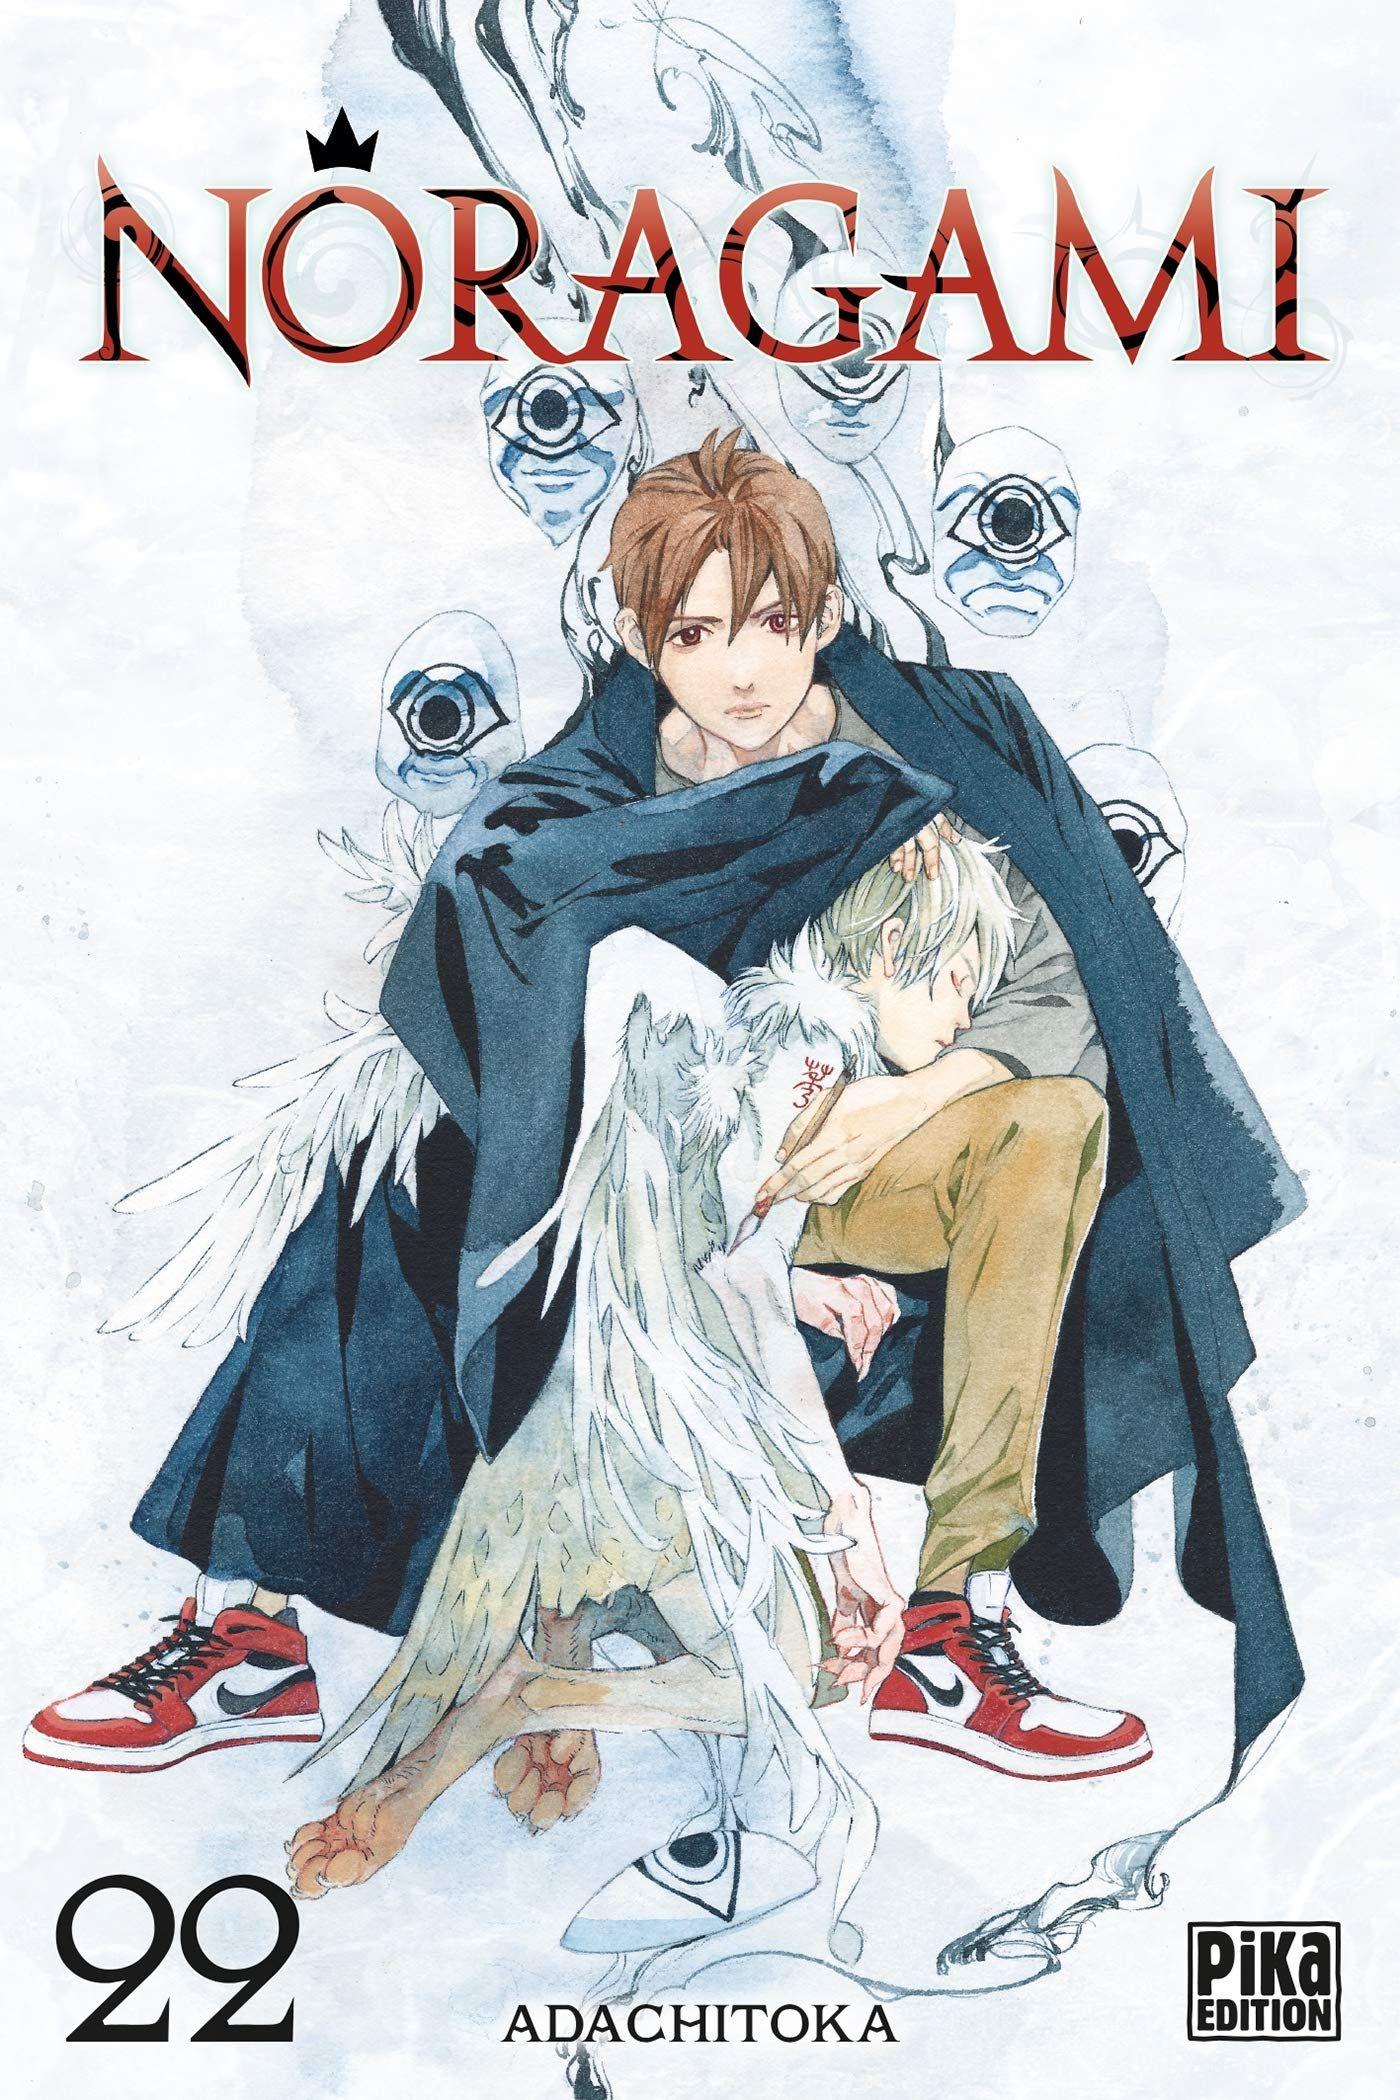 Sortie Manga au Québec JUIN 2021 Noragami-22-pika